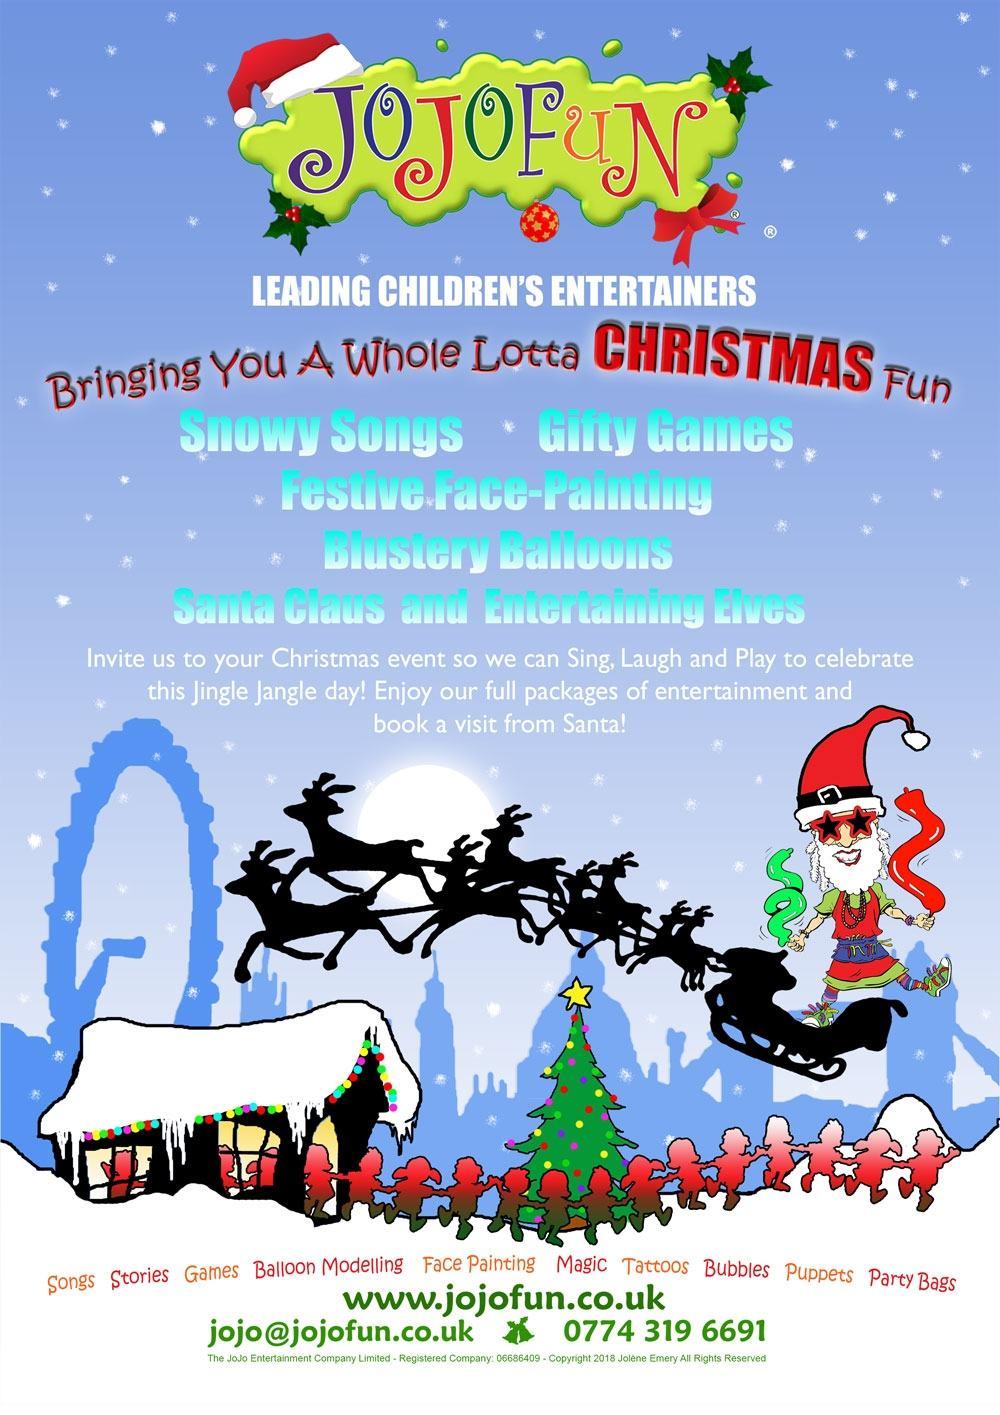 JoJoFun Christmas Party Children's Entertainers London